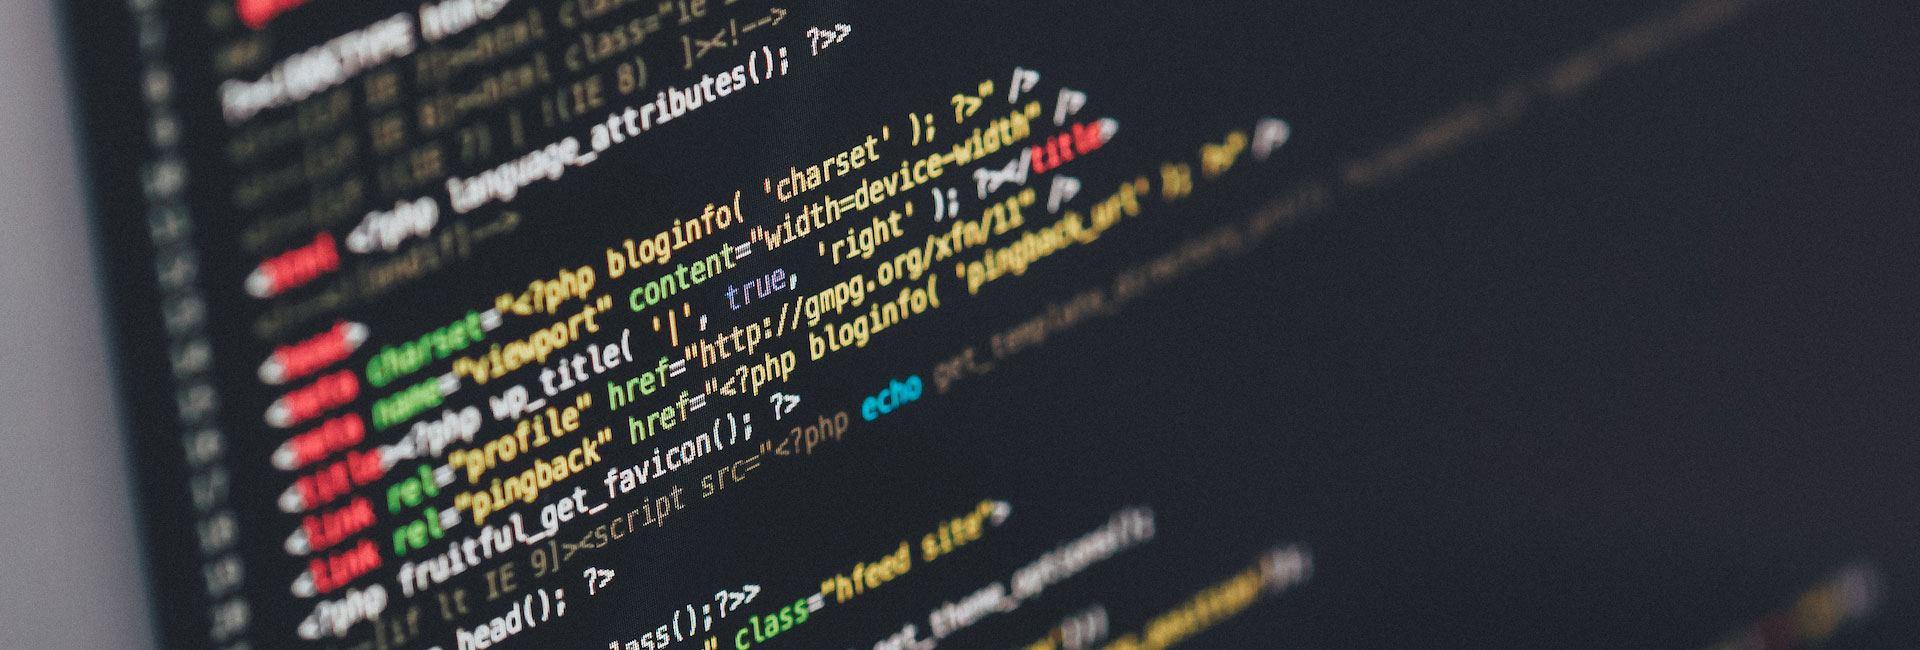 wordpress_programmoer